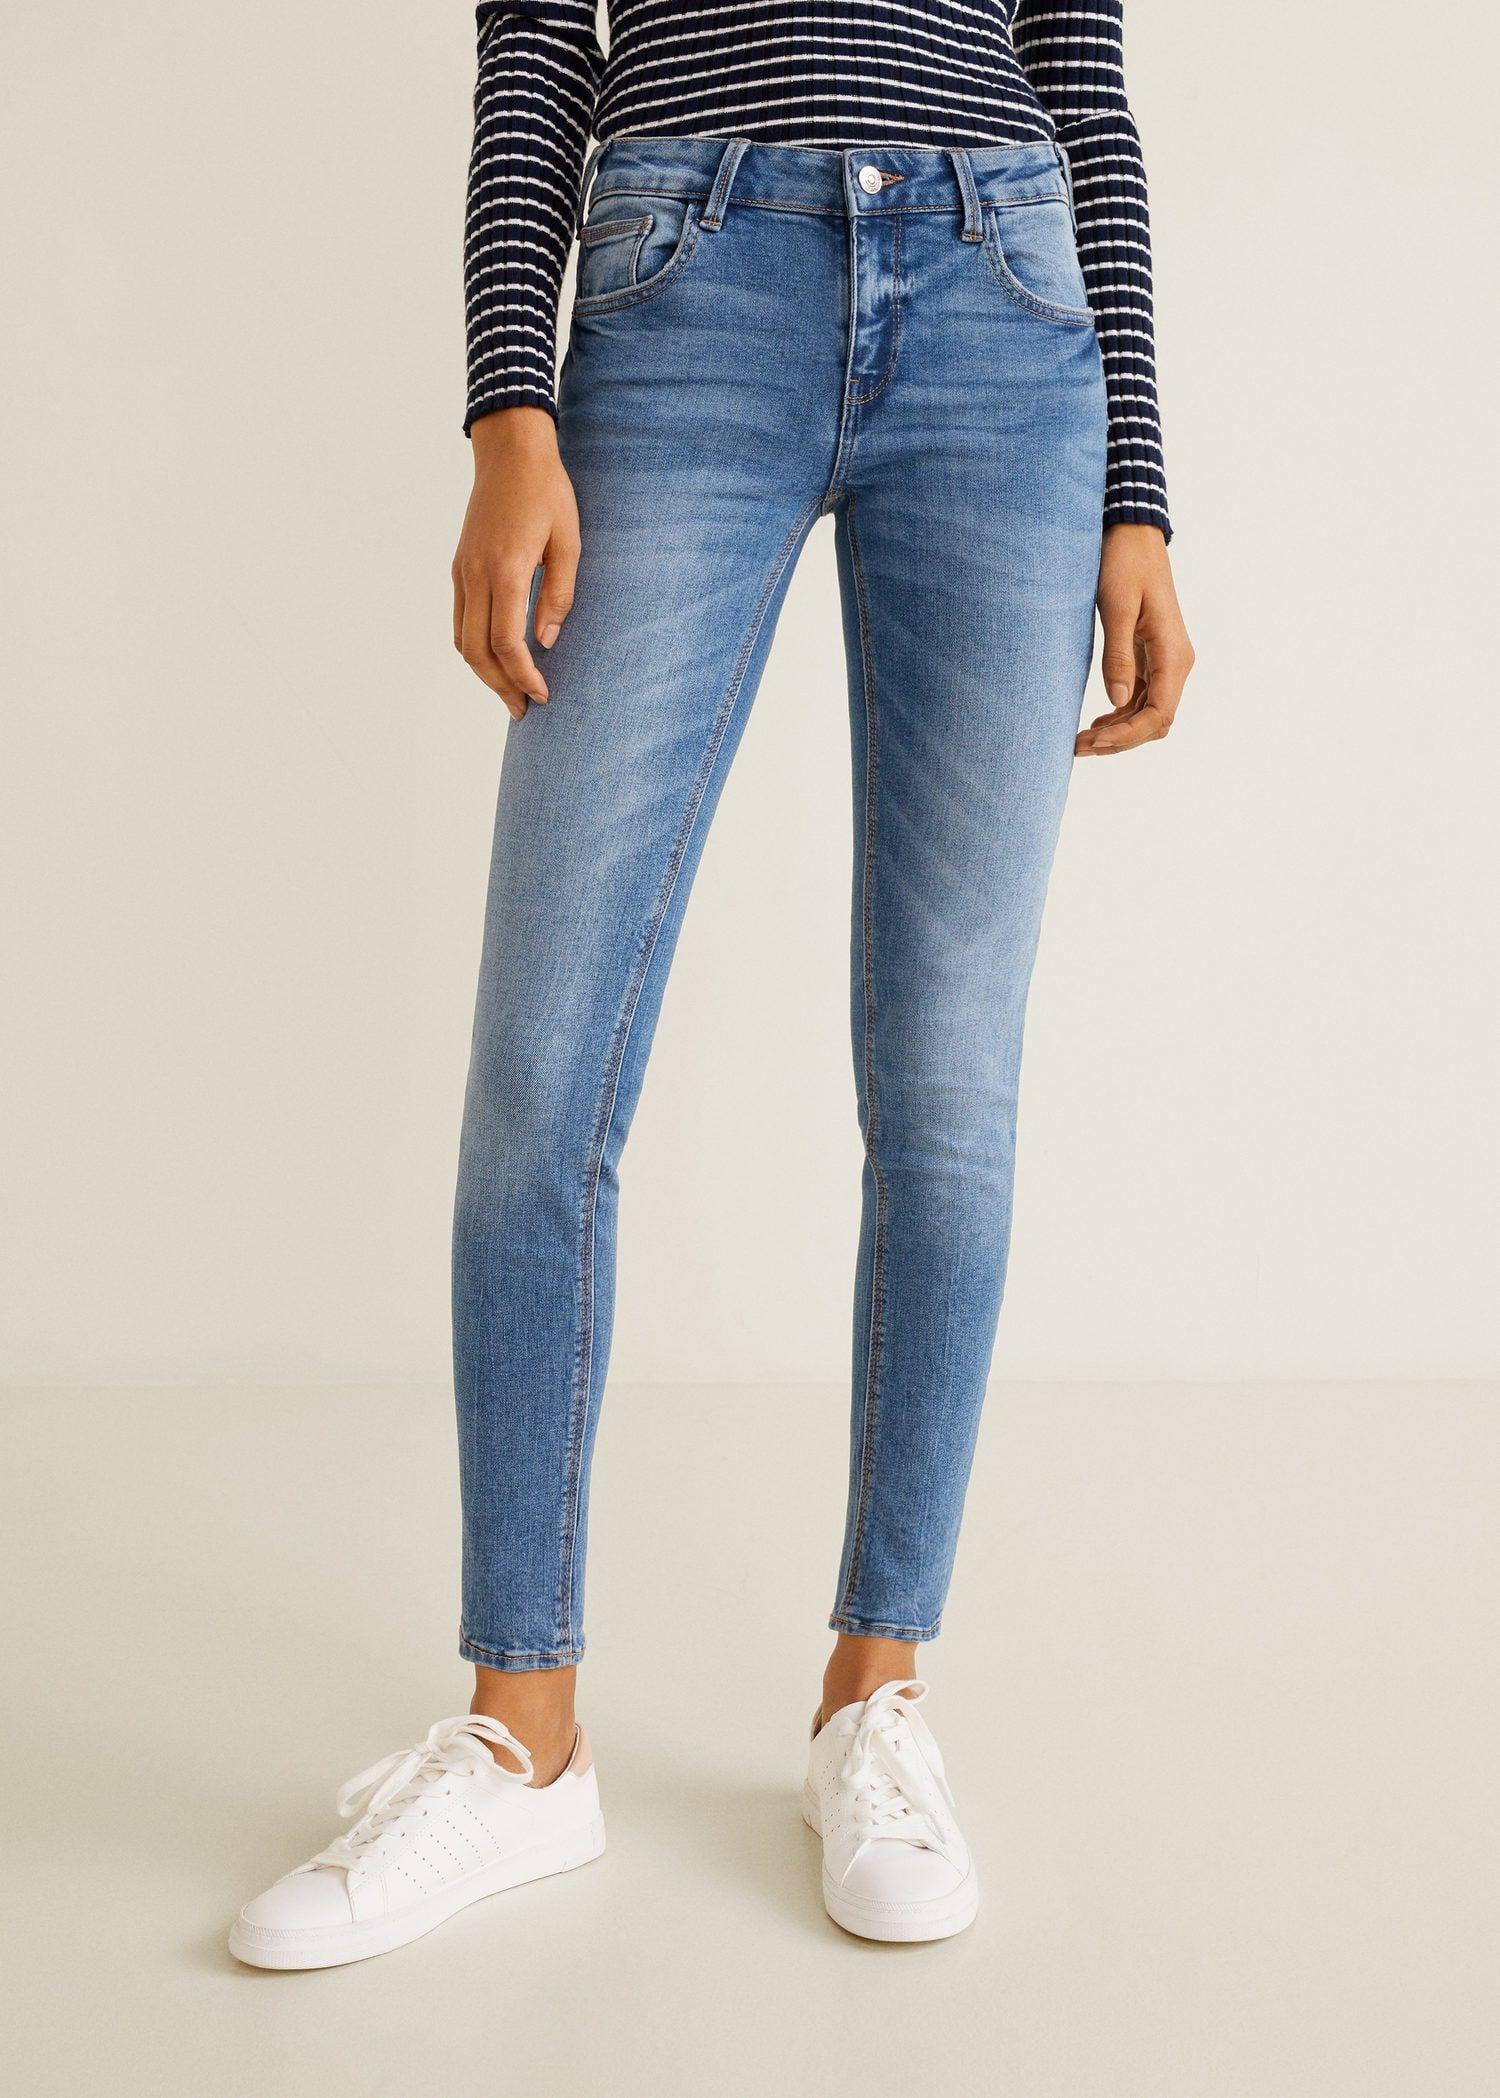 7b8821271 Jeans skinny push-up kim - Vaqueros de Mujer en 2019 | Pantalones ...